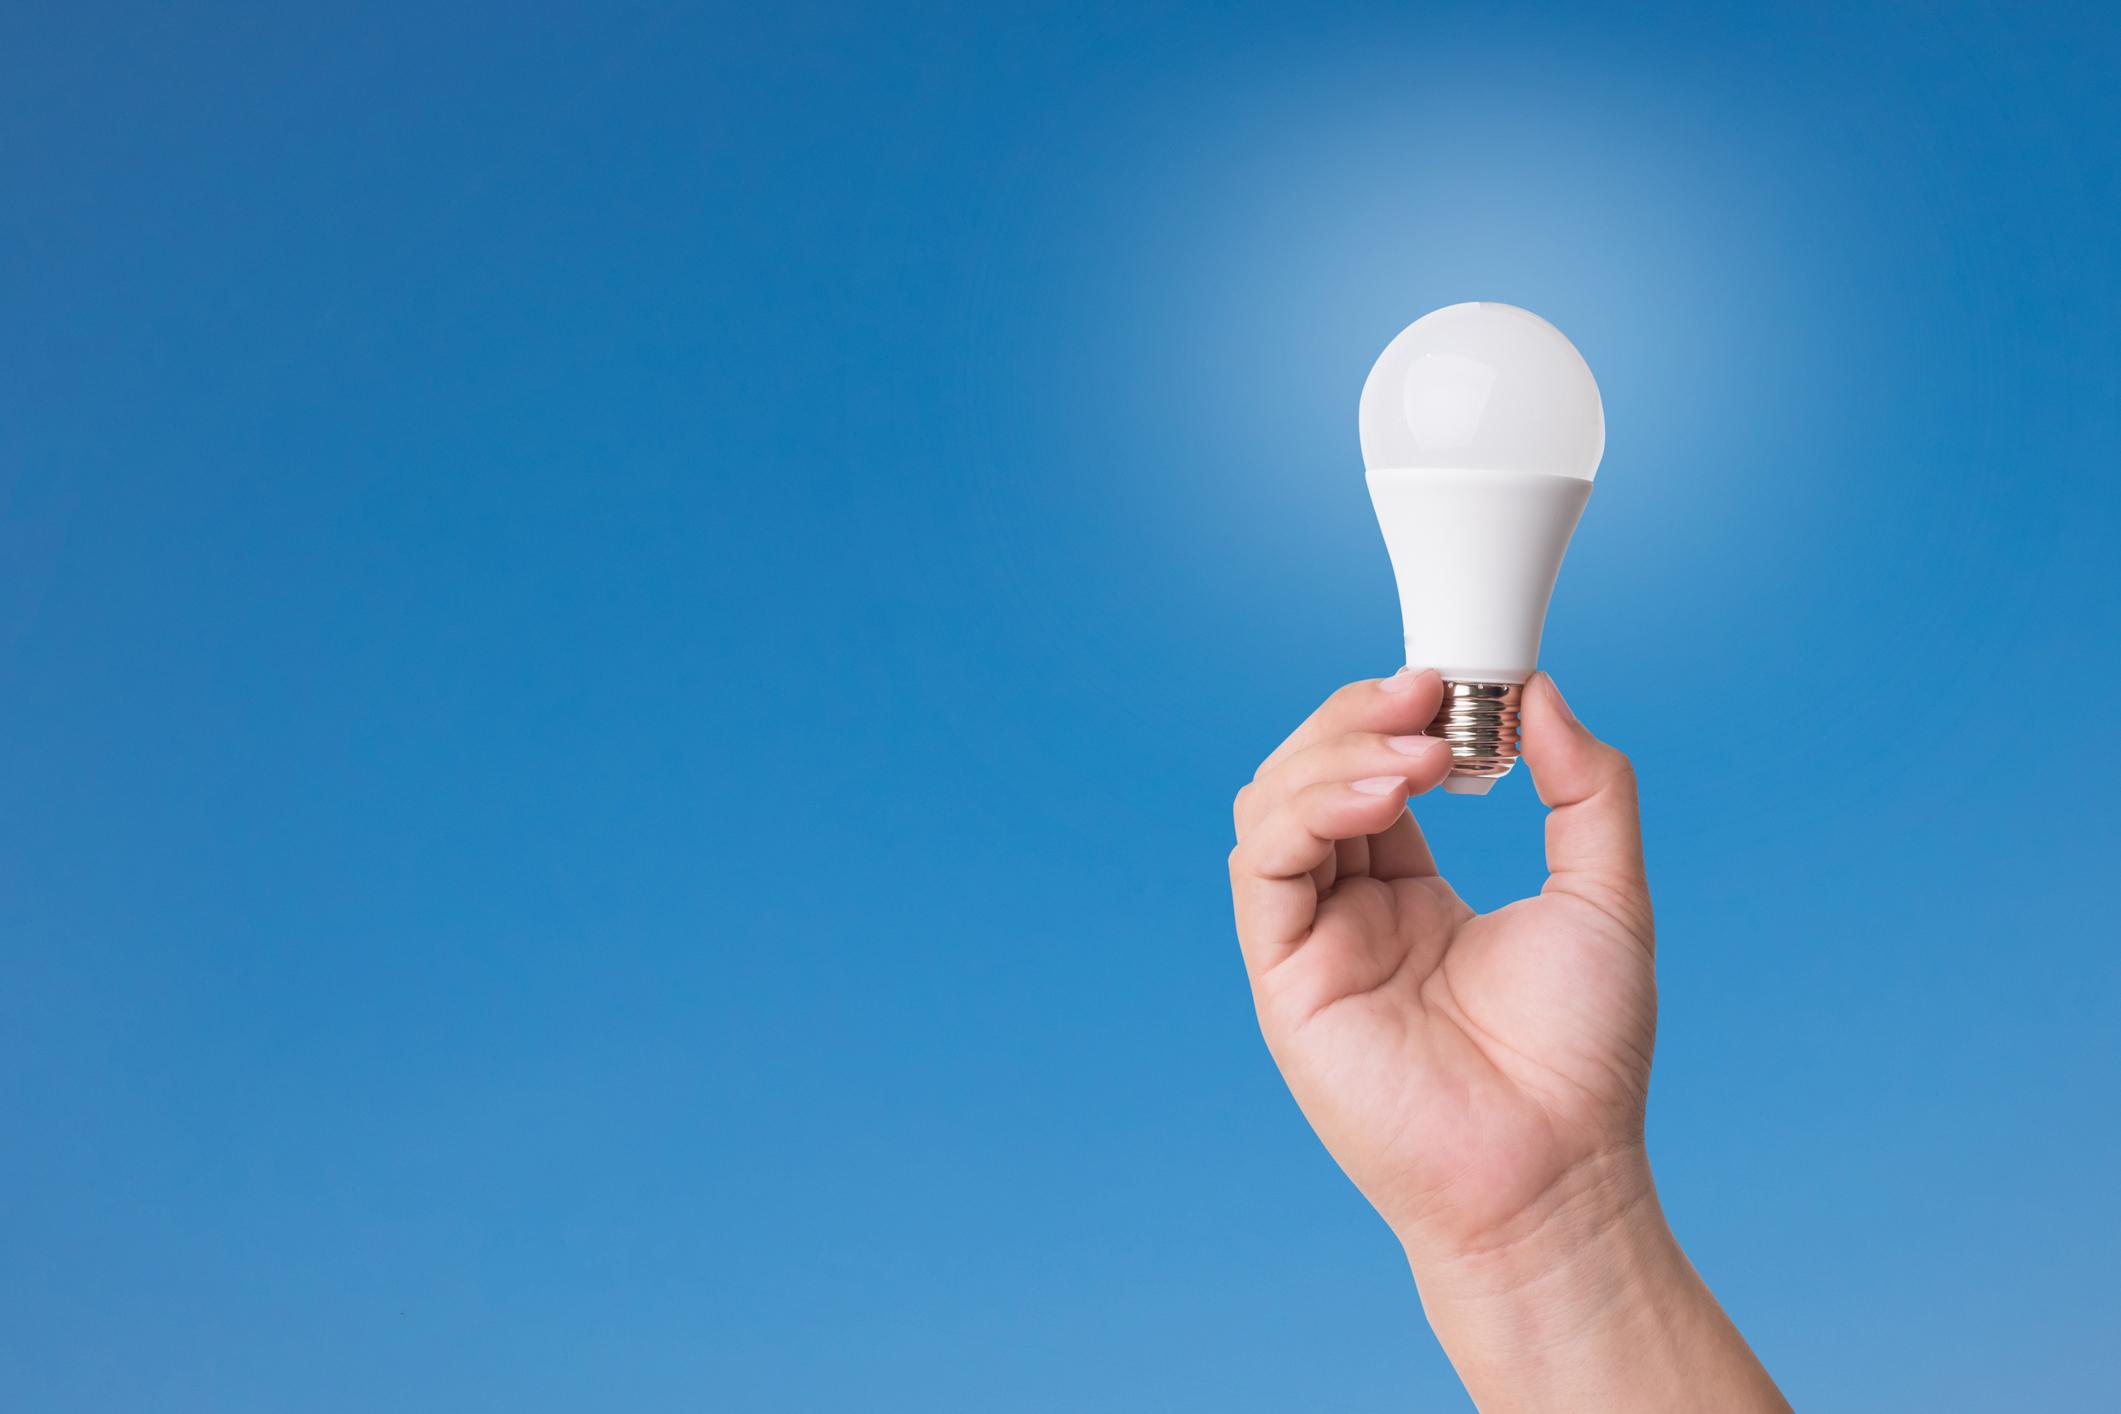 Person holding an LED lightbulb.